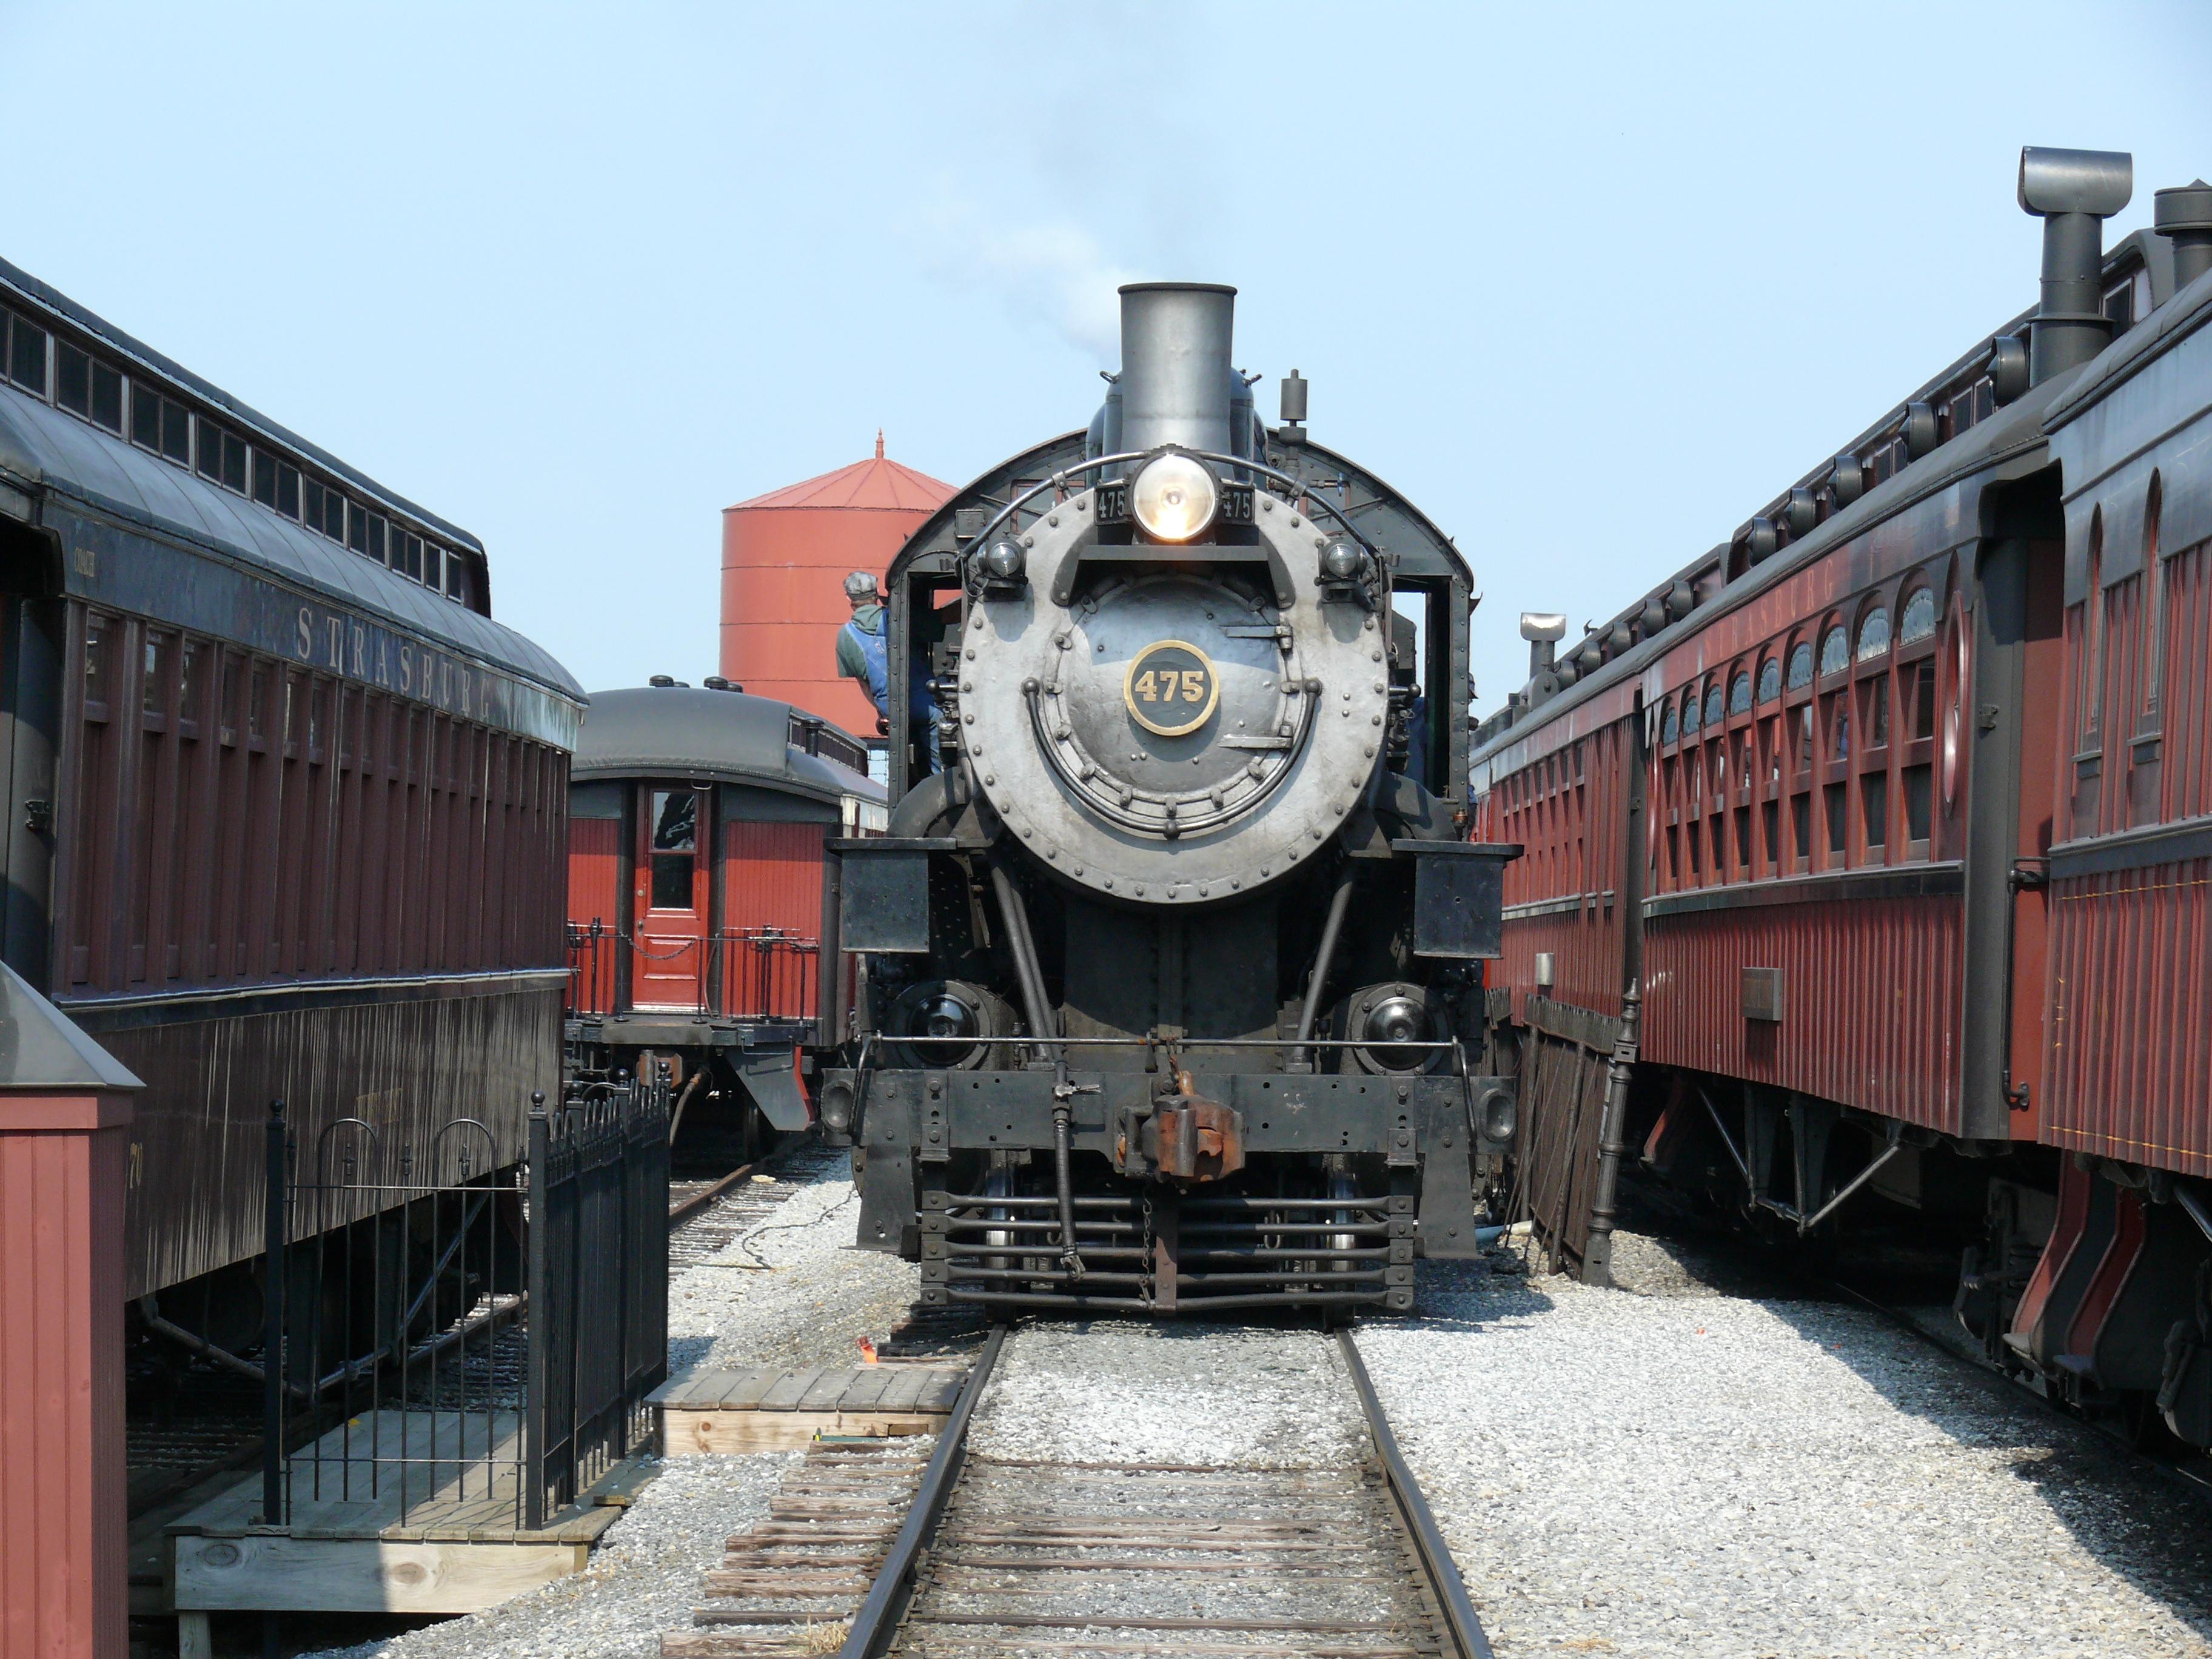 File:Steam locomotive 4-8-0 475 8.JPG